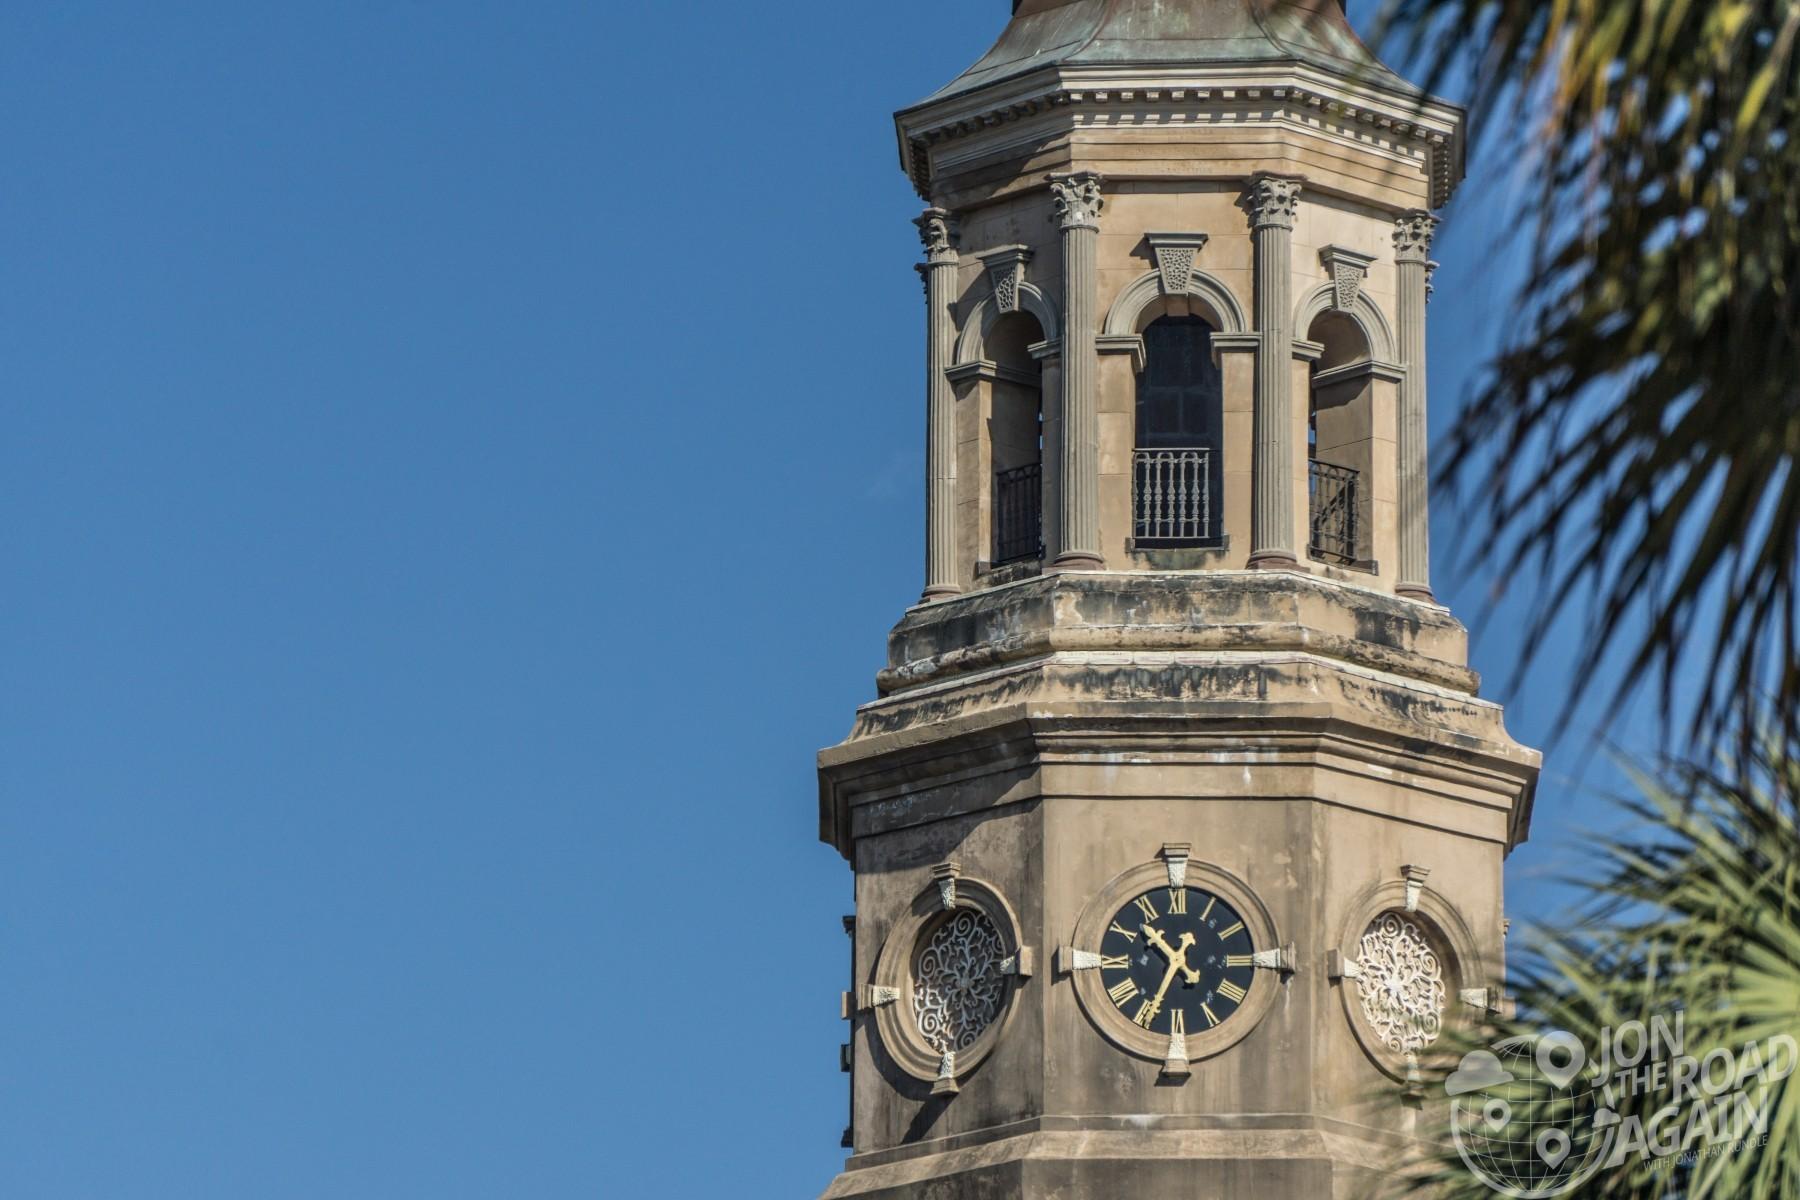 St. Philips Episcopal Church tower